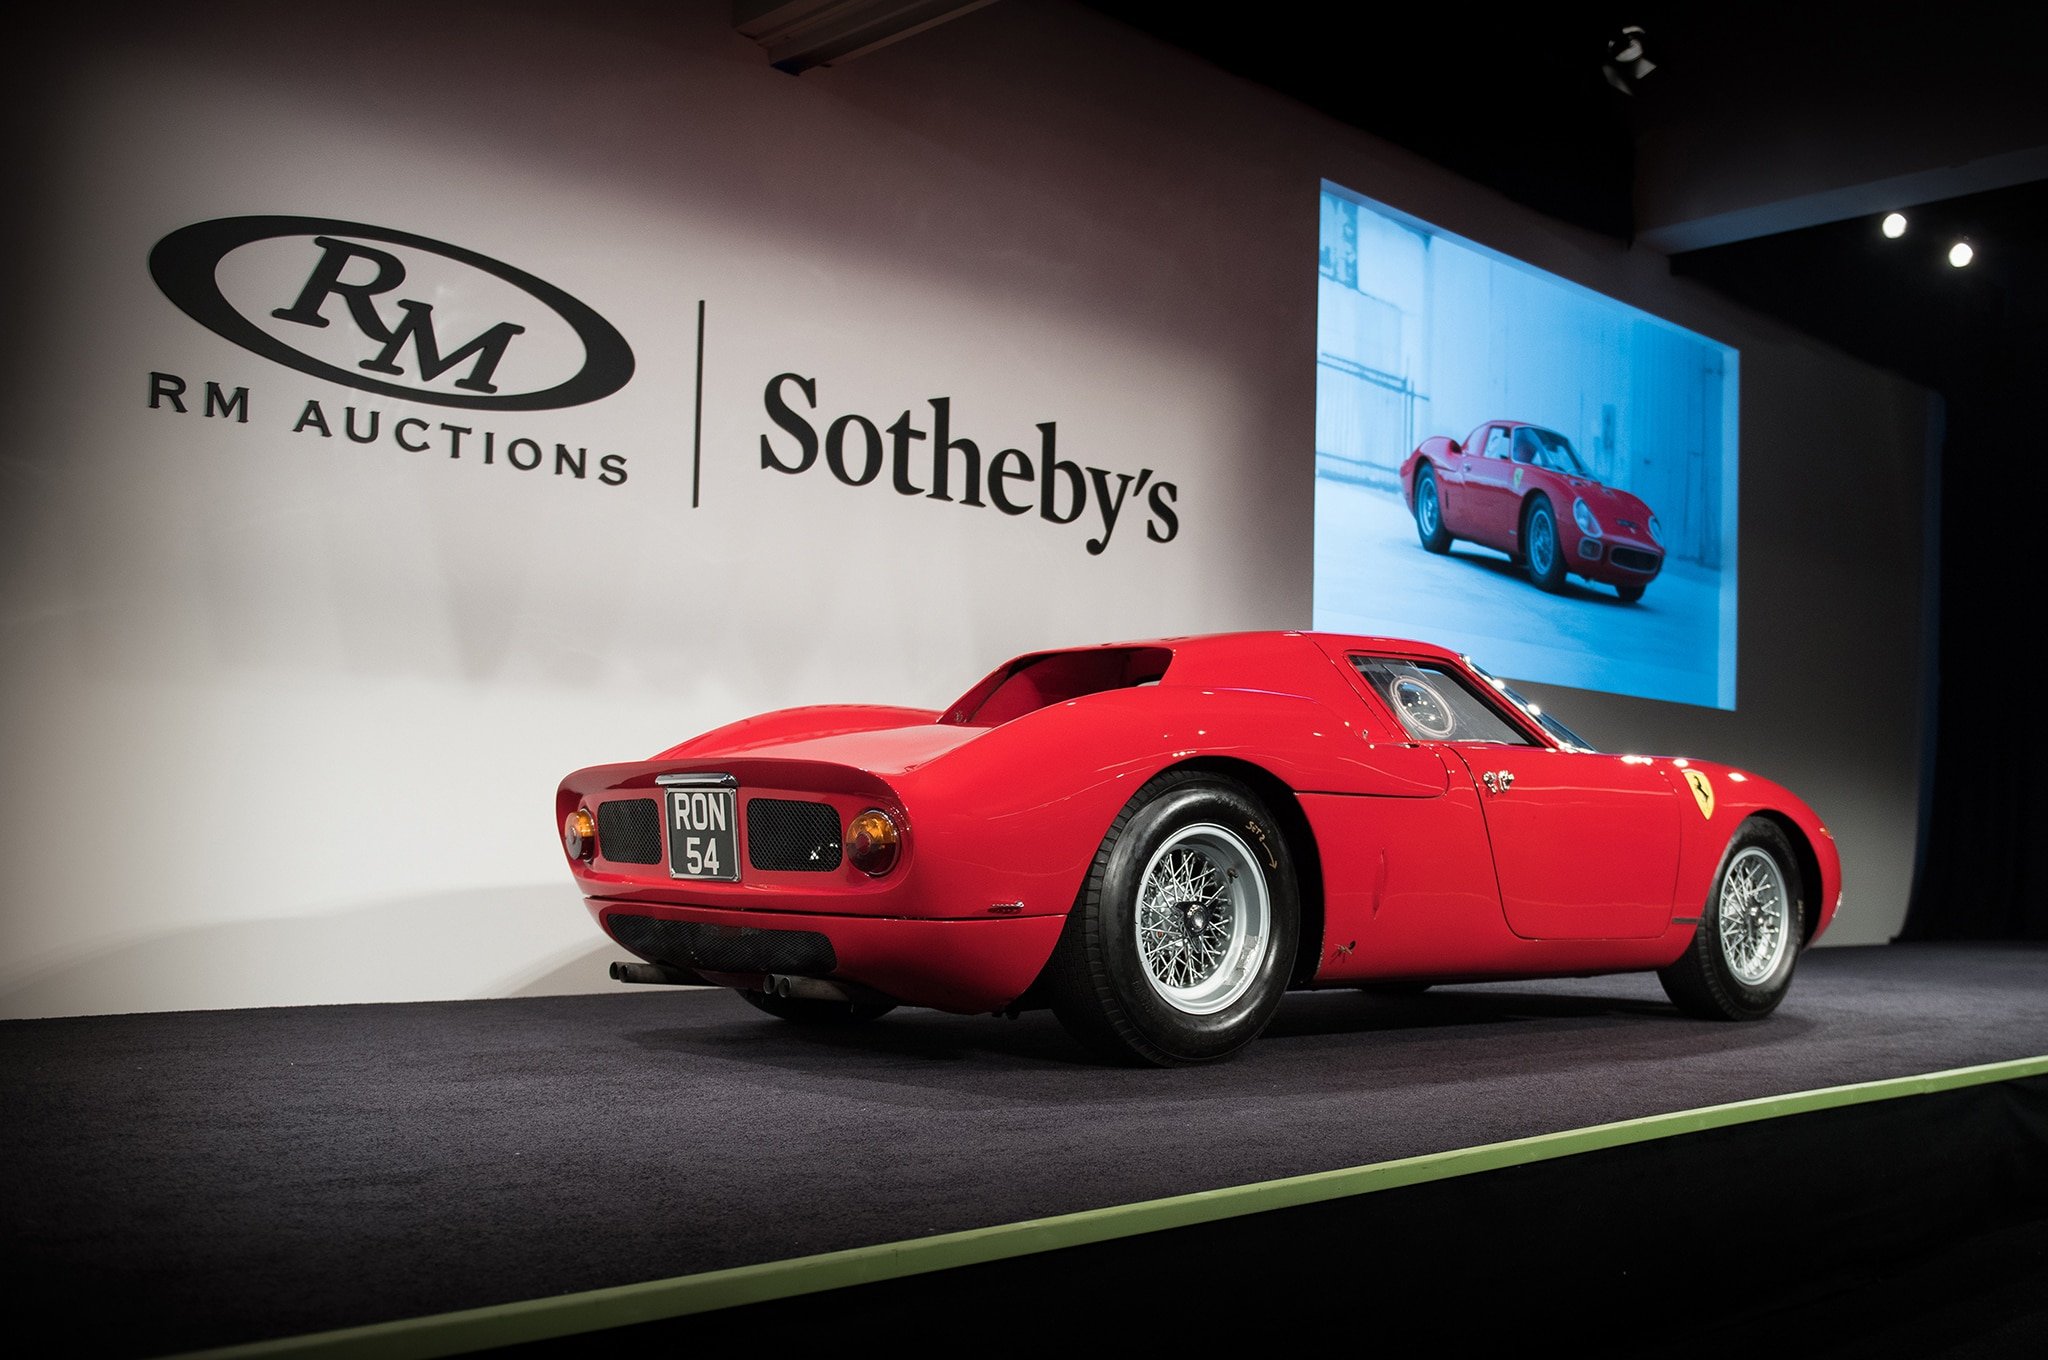 2015 Monterey Car Week Auction Wrap Up Over 340 Million